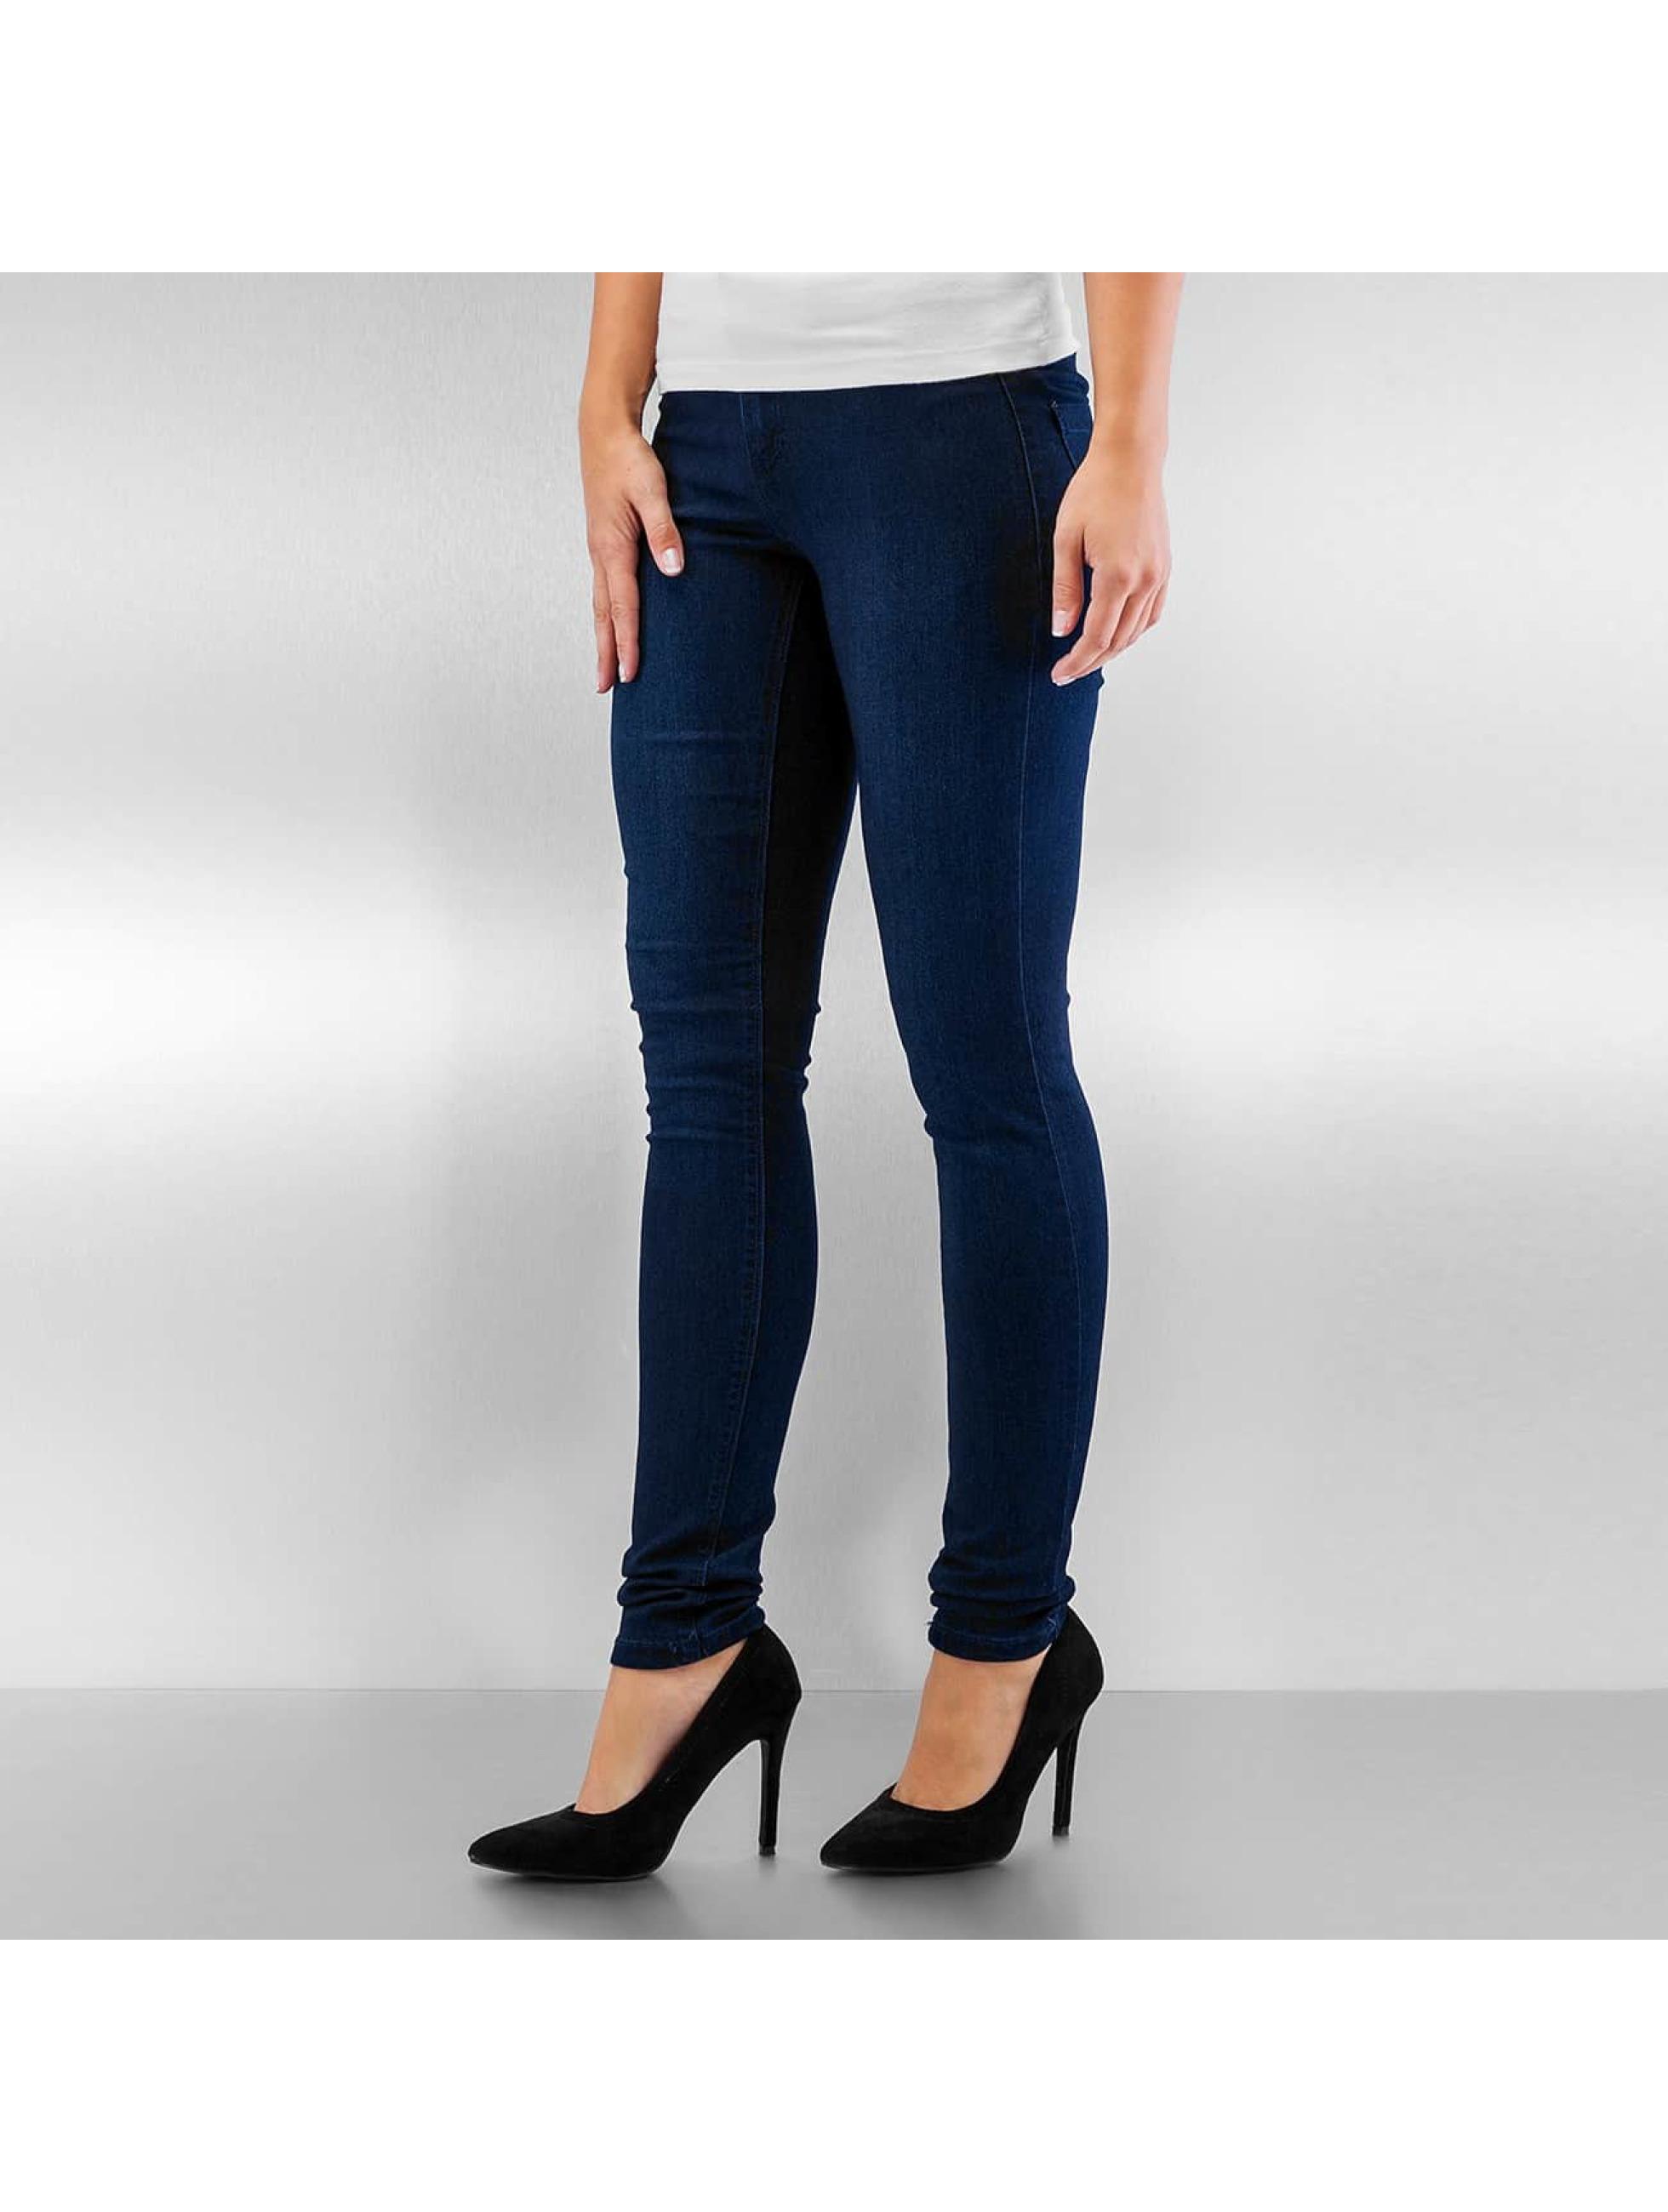 Vero Moda Jean / Slim VMFlex-It en bleu